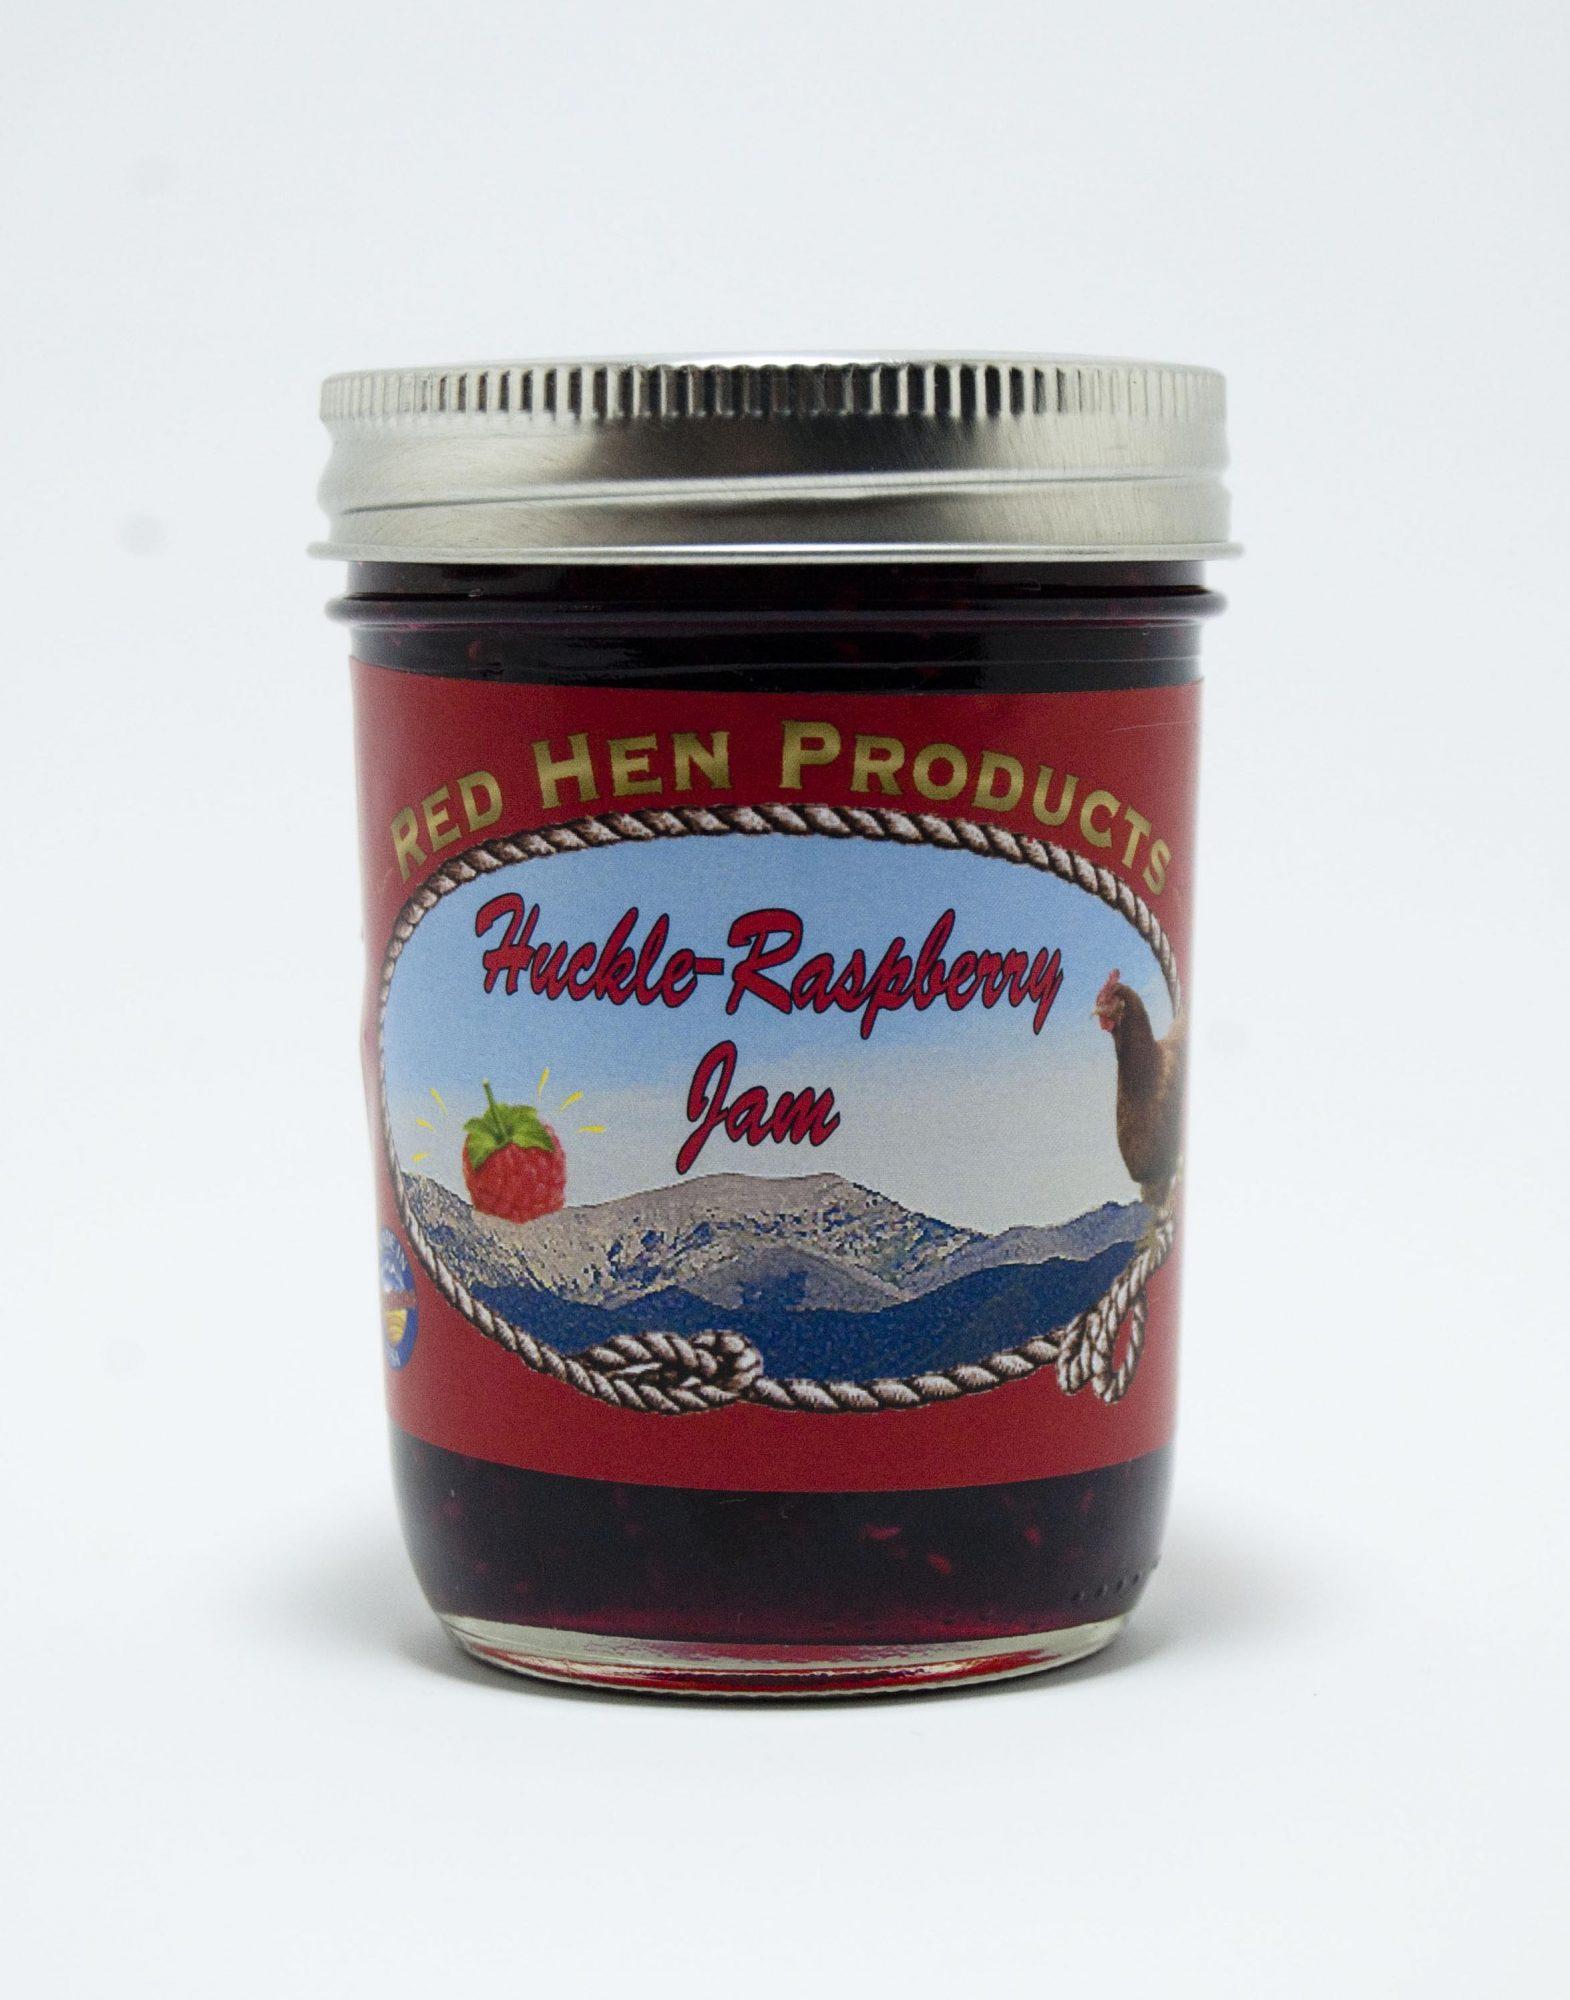 Huckle-Raspberry Jam